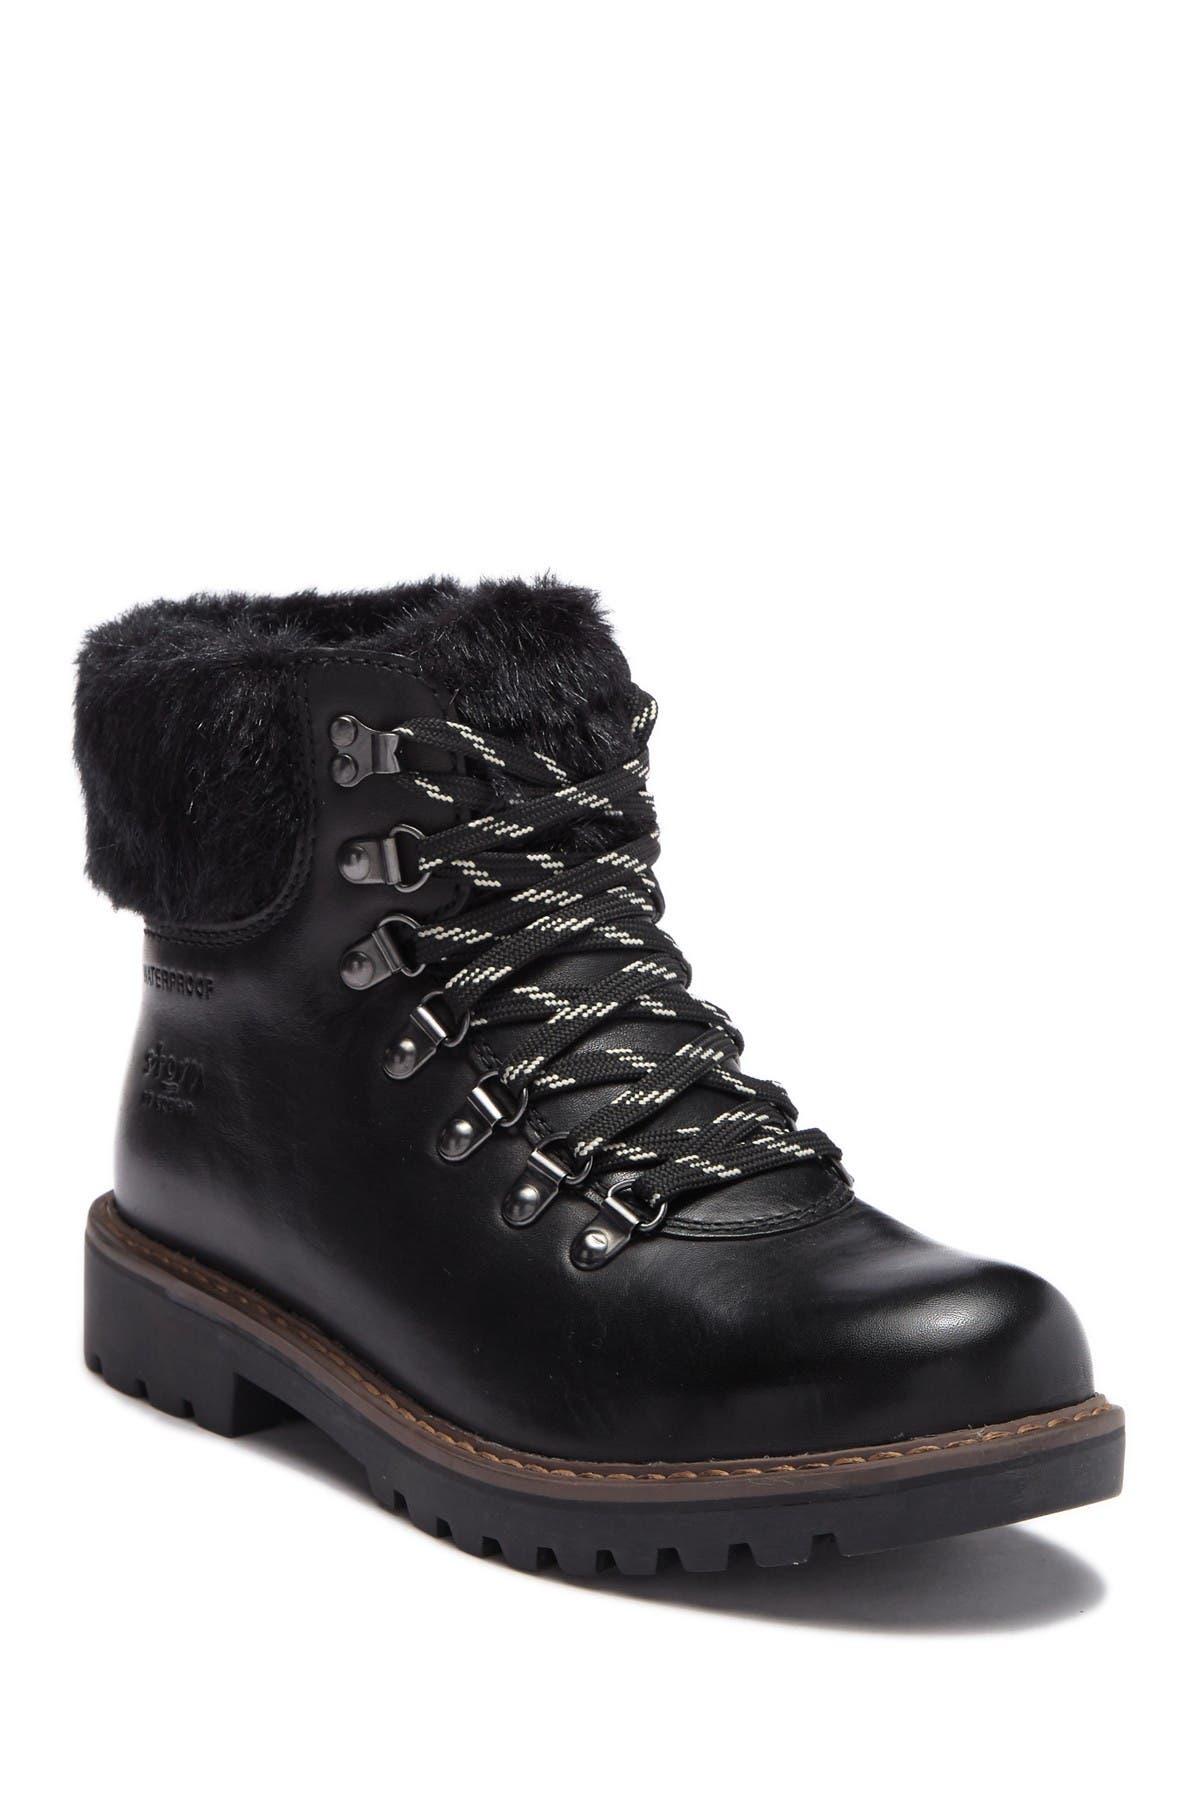 Image of Cougar Harlow Waterproof Faux Fur Lined Boot